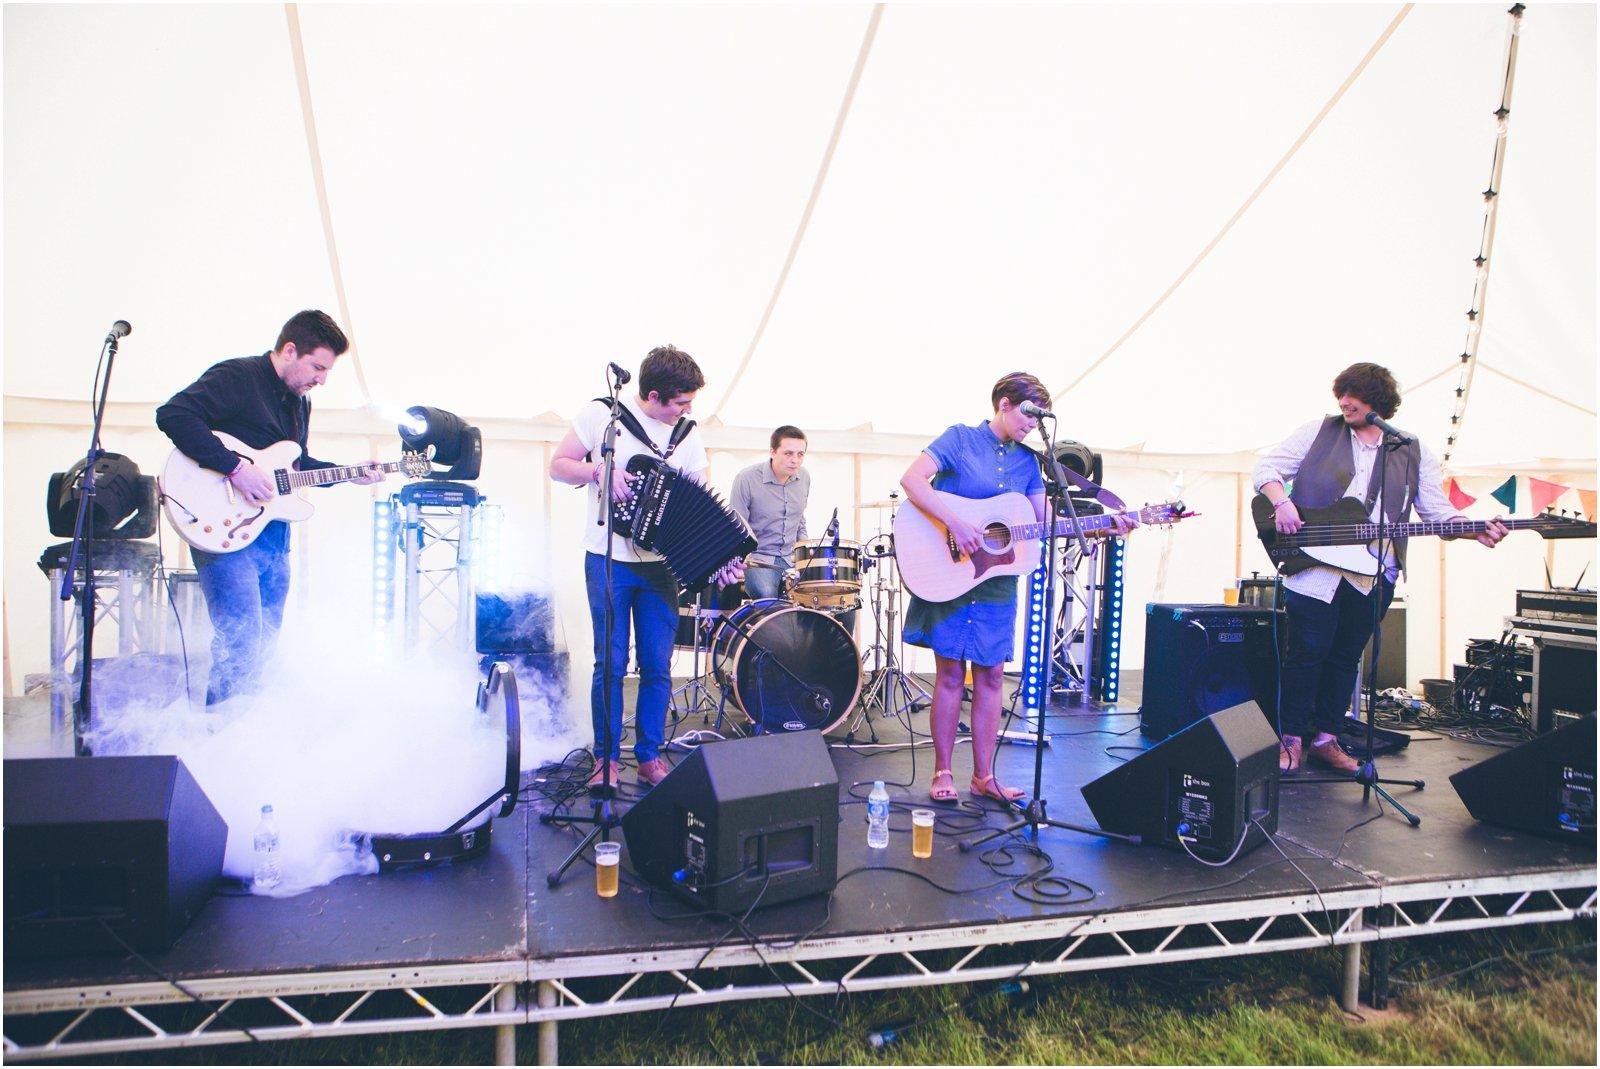 Sally and Damien's wedding festival by Summertown Pictures-59_DerrynSchmidt